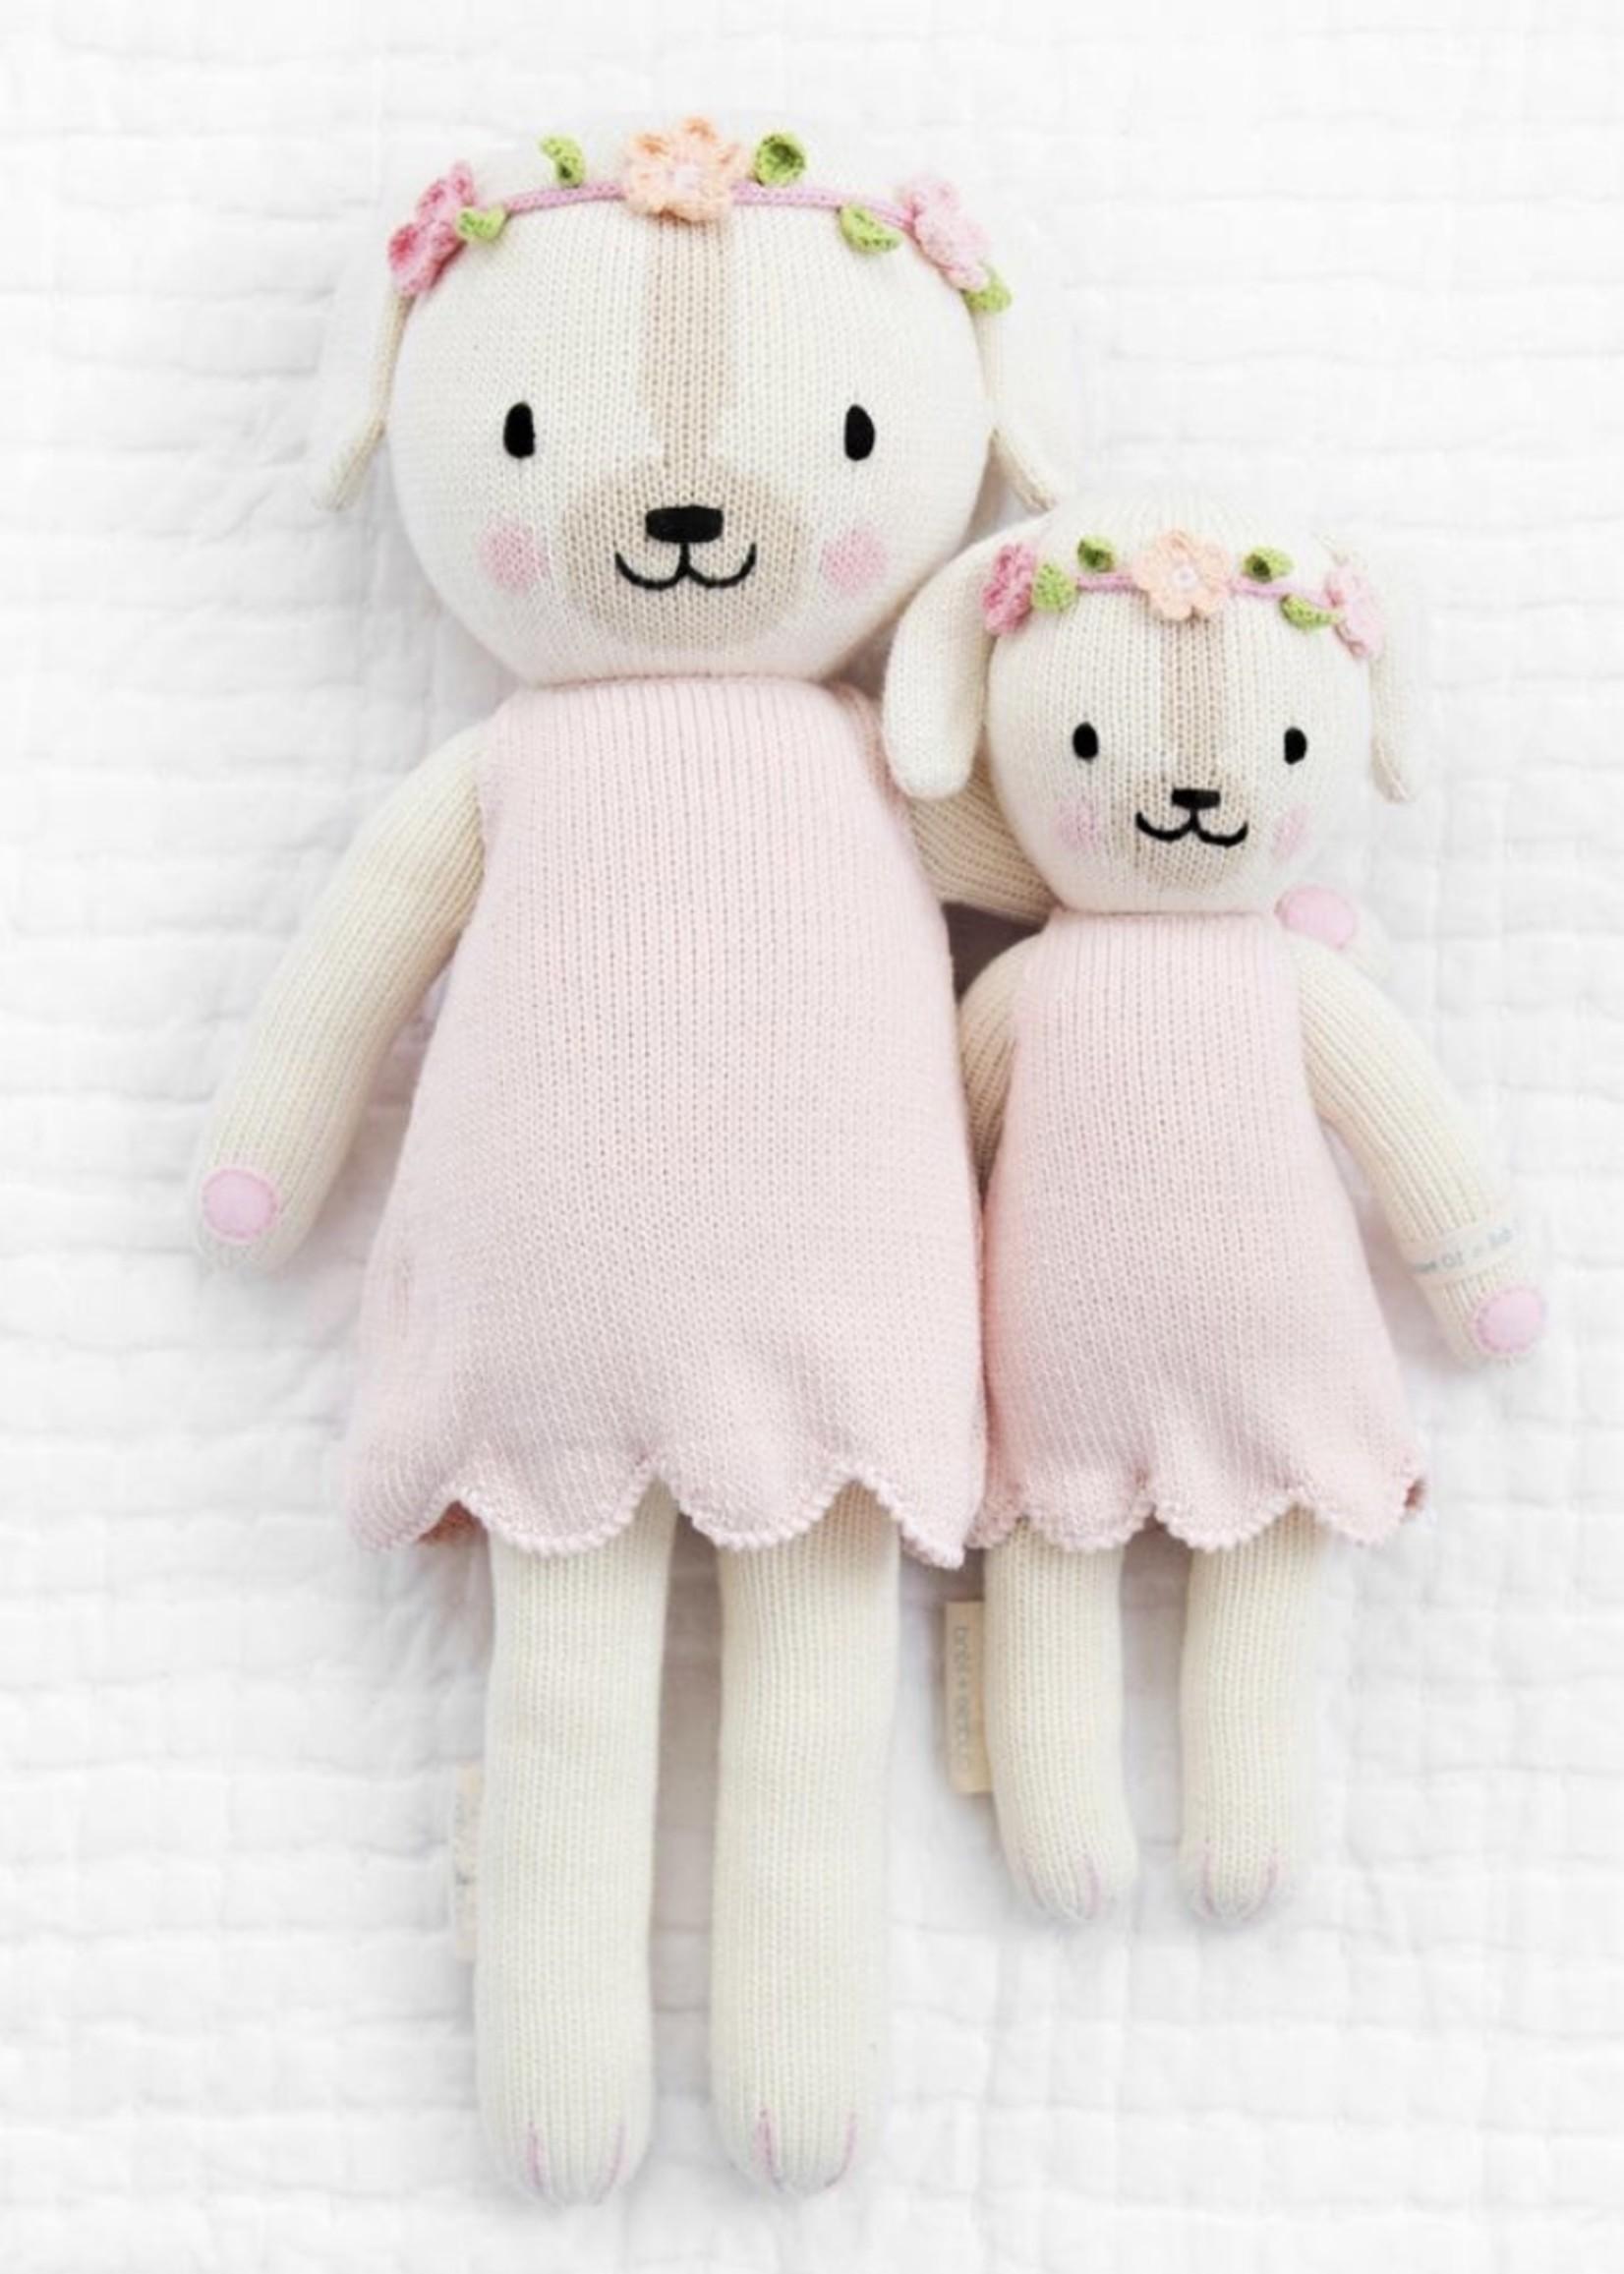 cuddle + kind Big Dog Knit Doll CHARLOTTE